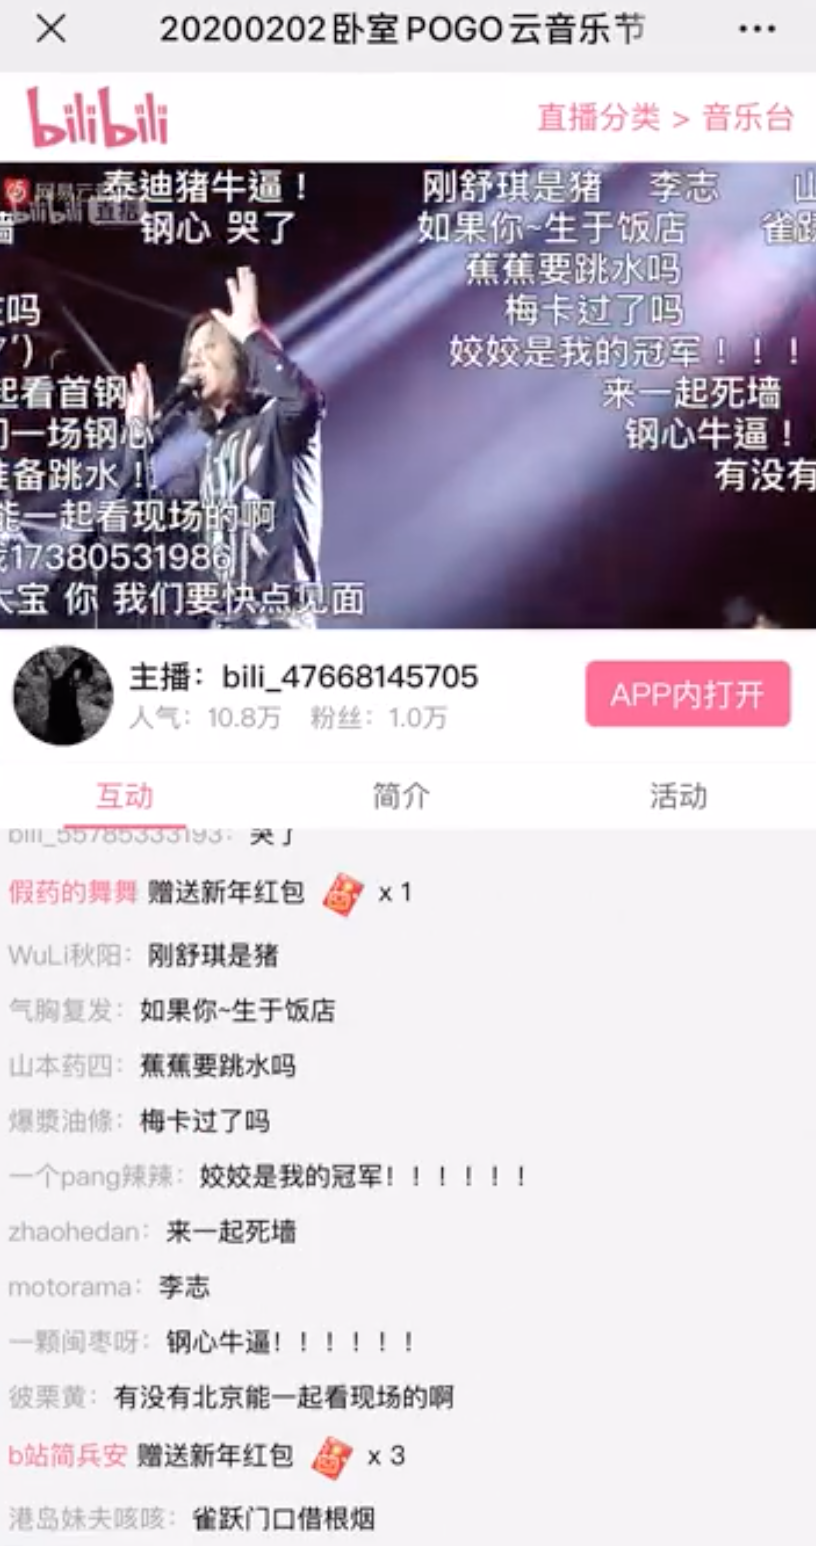 Cloud music festival in China because of coronavirus